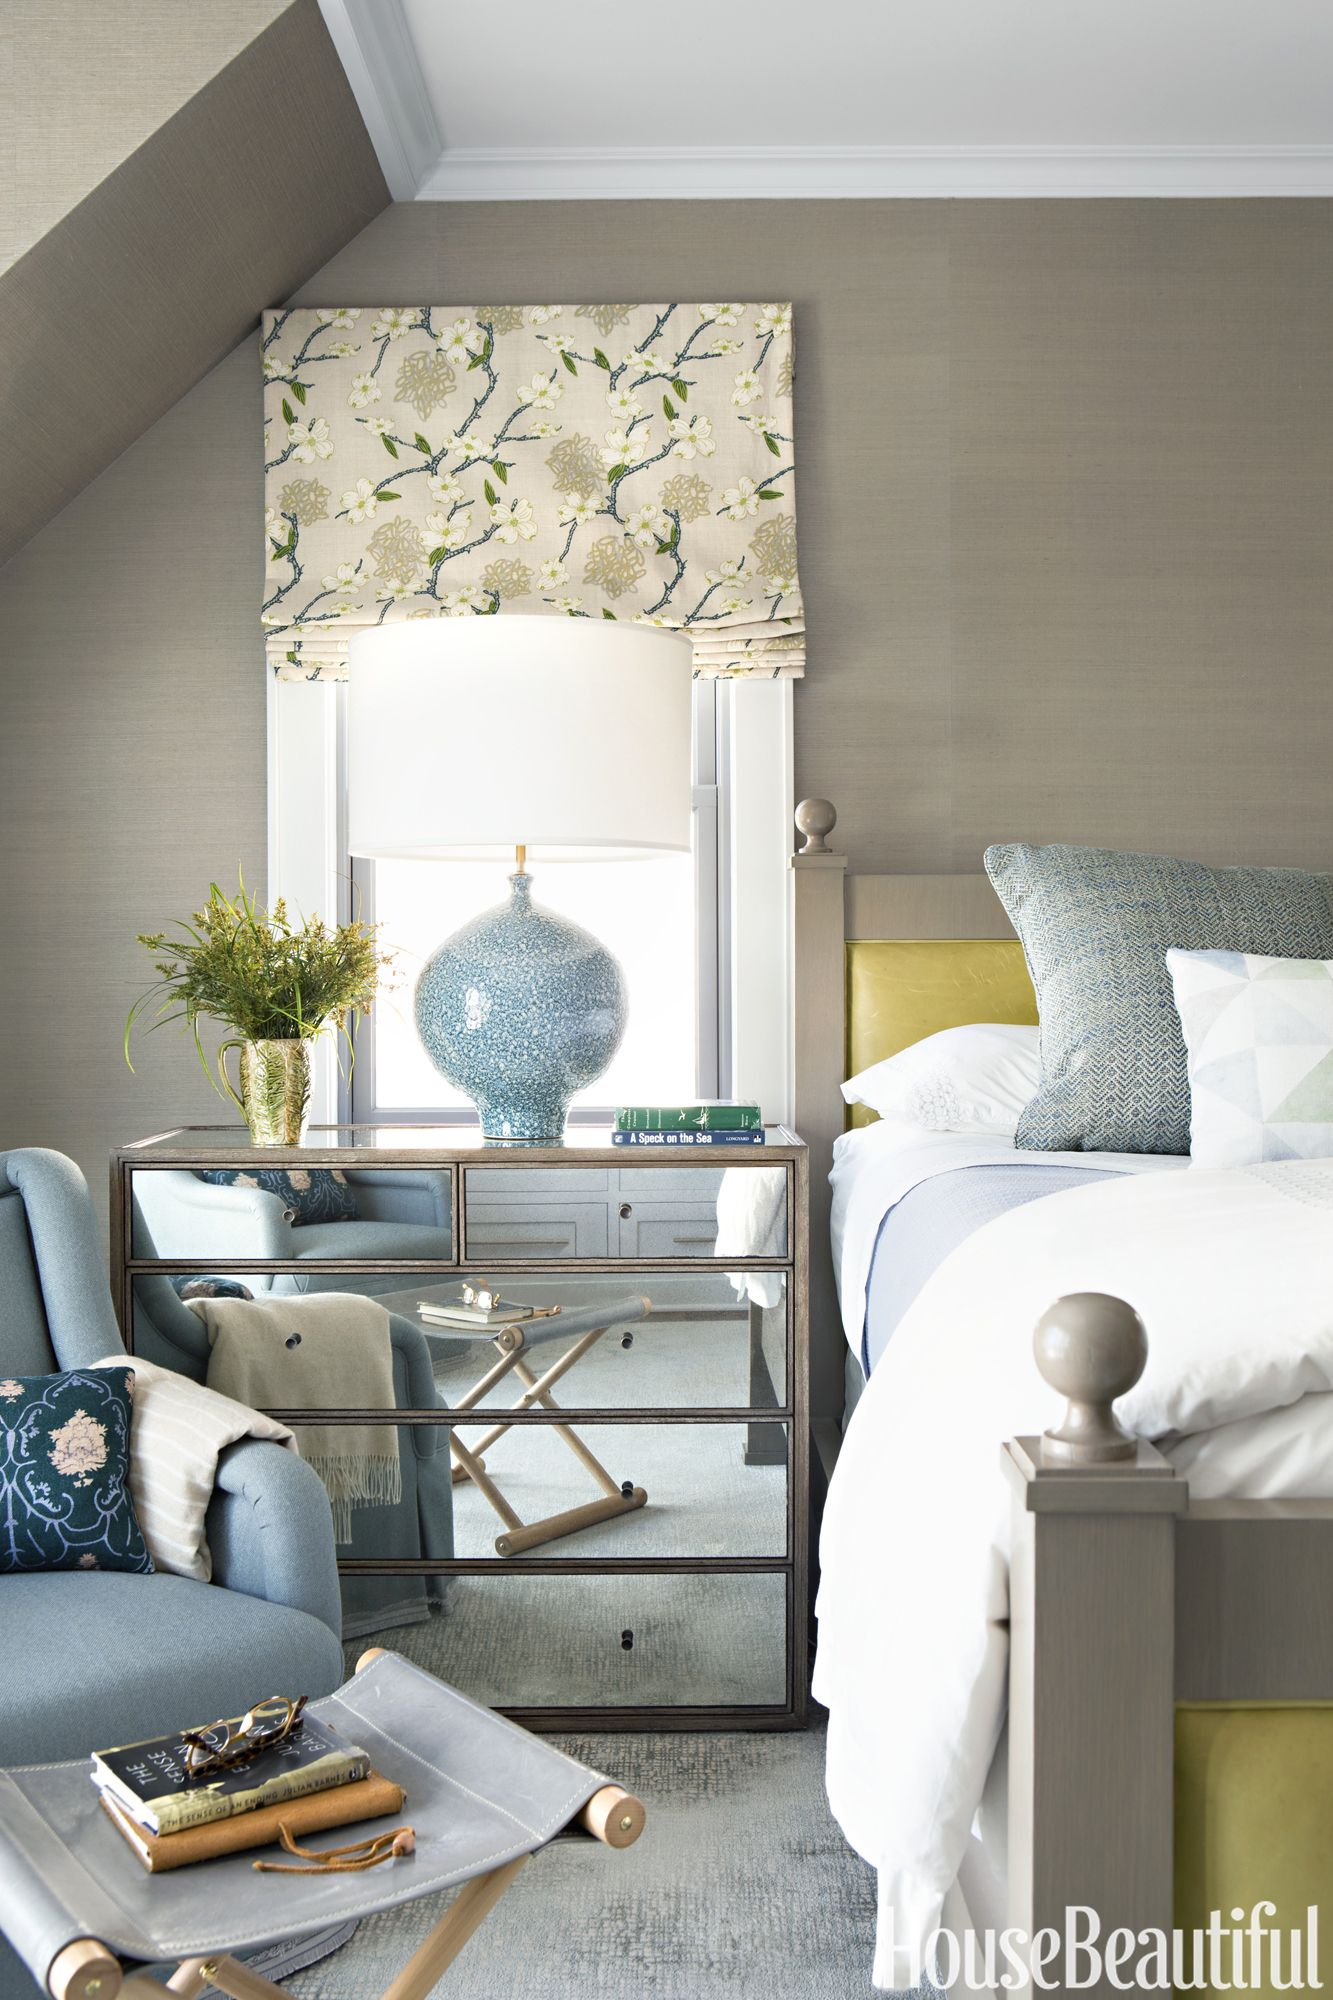 joe lucas bedroom & 34 Best Window Treatment Ideas - Modern Curtains Blinds \u0026 Coverings